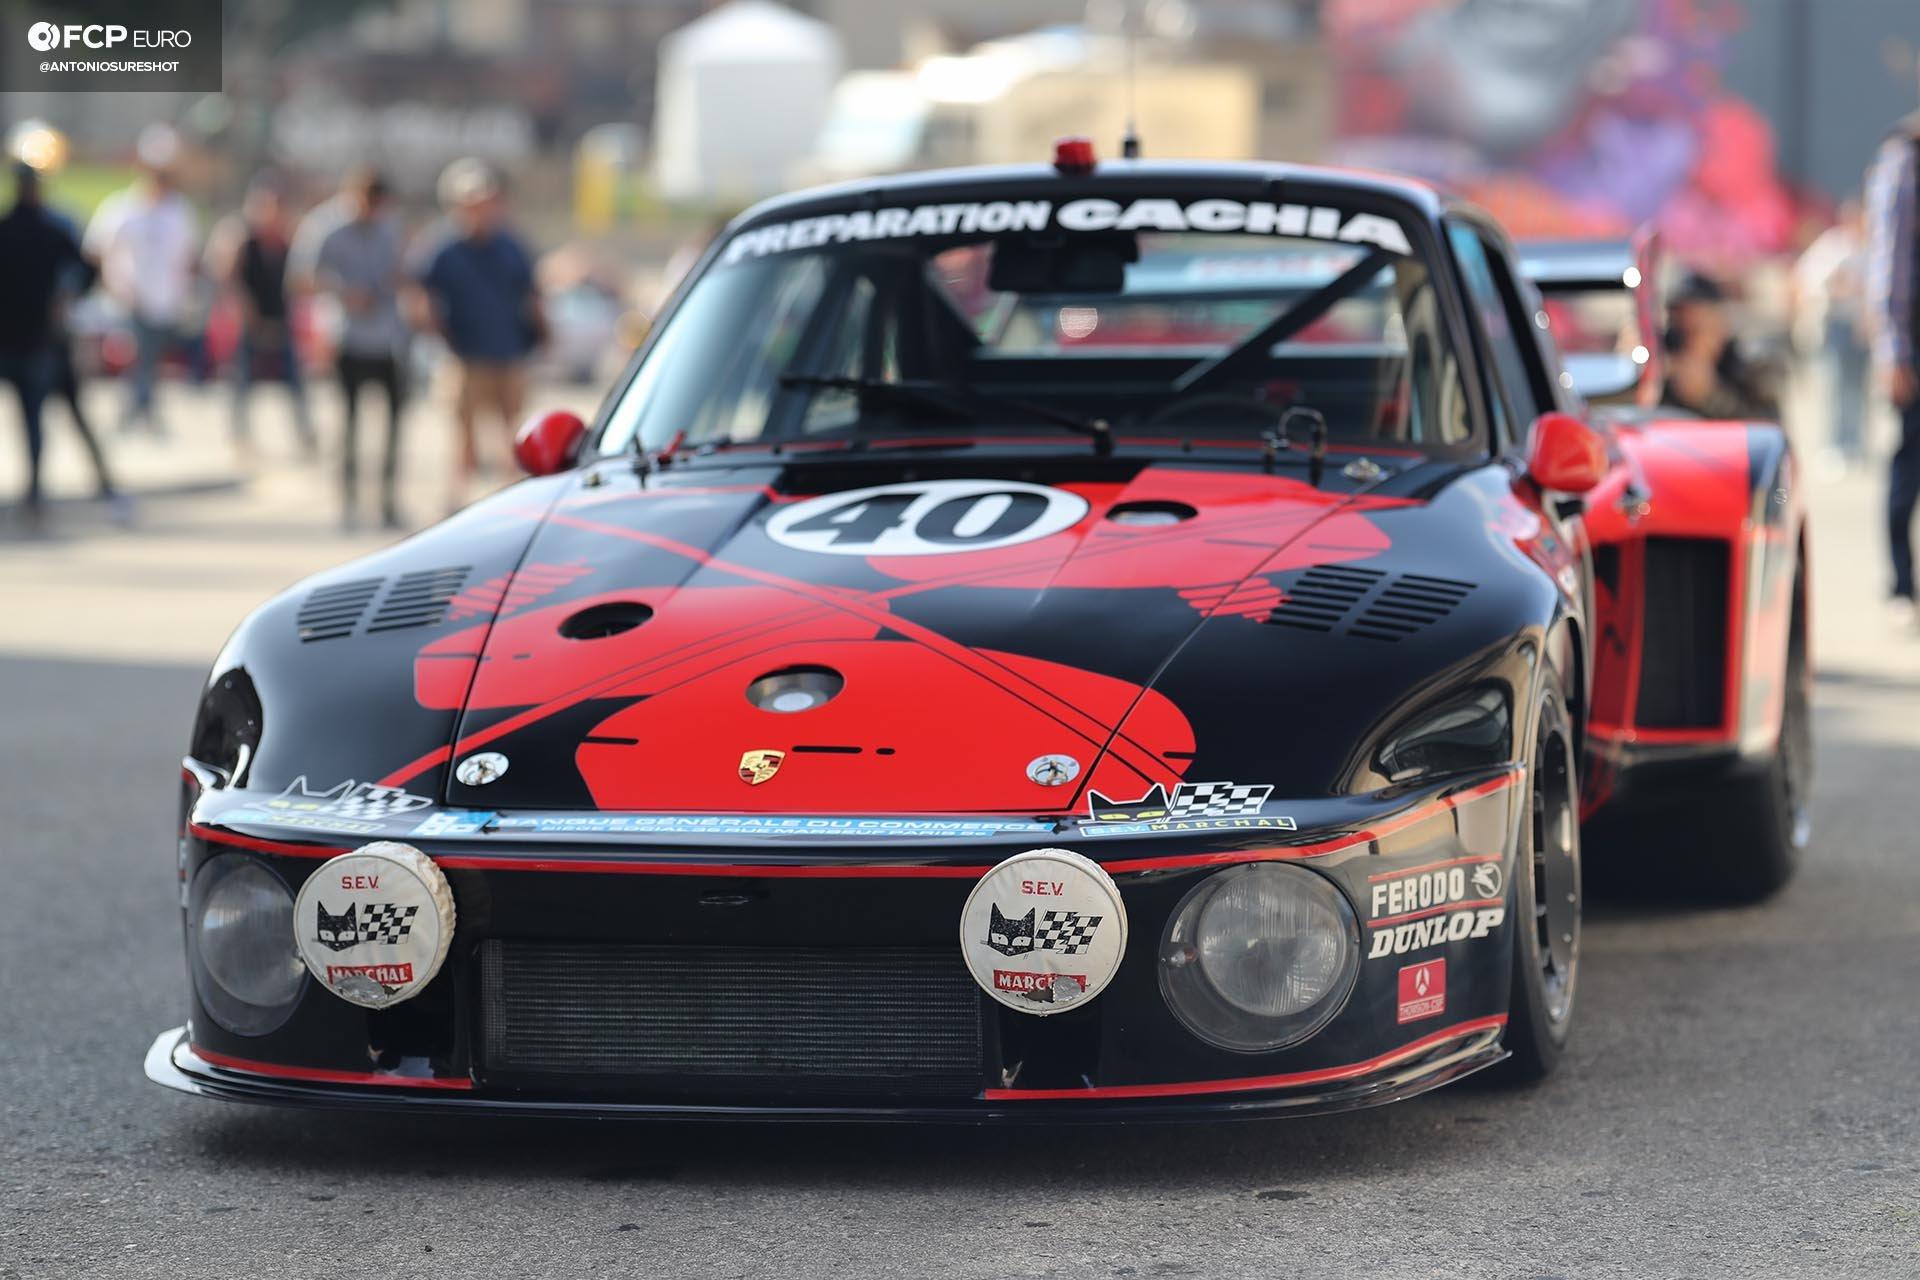 Luftgekühlt Air Cooled Porsche JMS Racing 935 Turbo